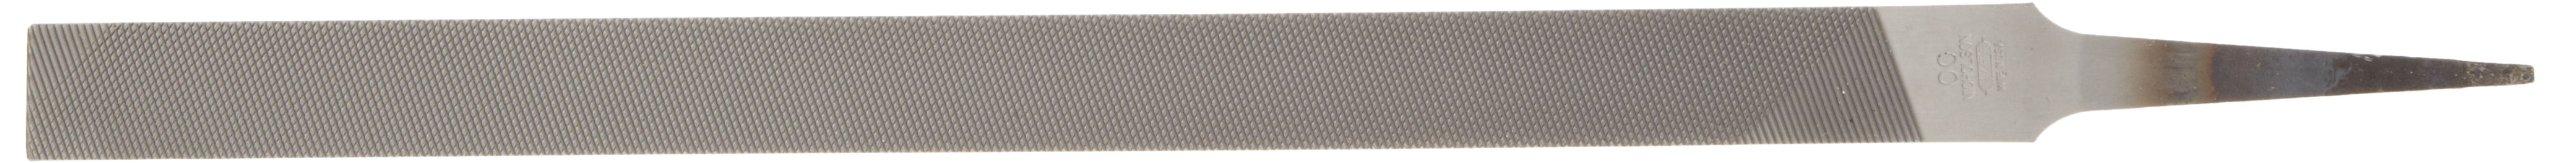 Nicholson Pillar File, Swiss Pattern, Double Cut, Rectangular, 00 Coarseness, 12'' Length